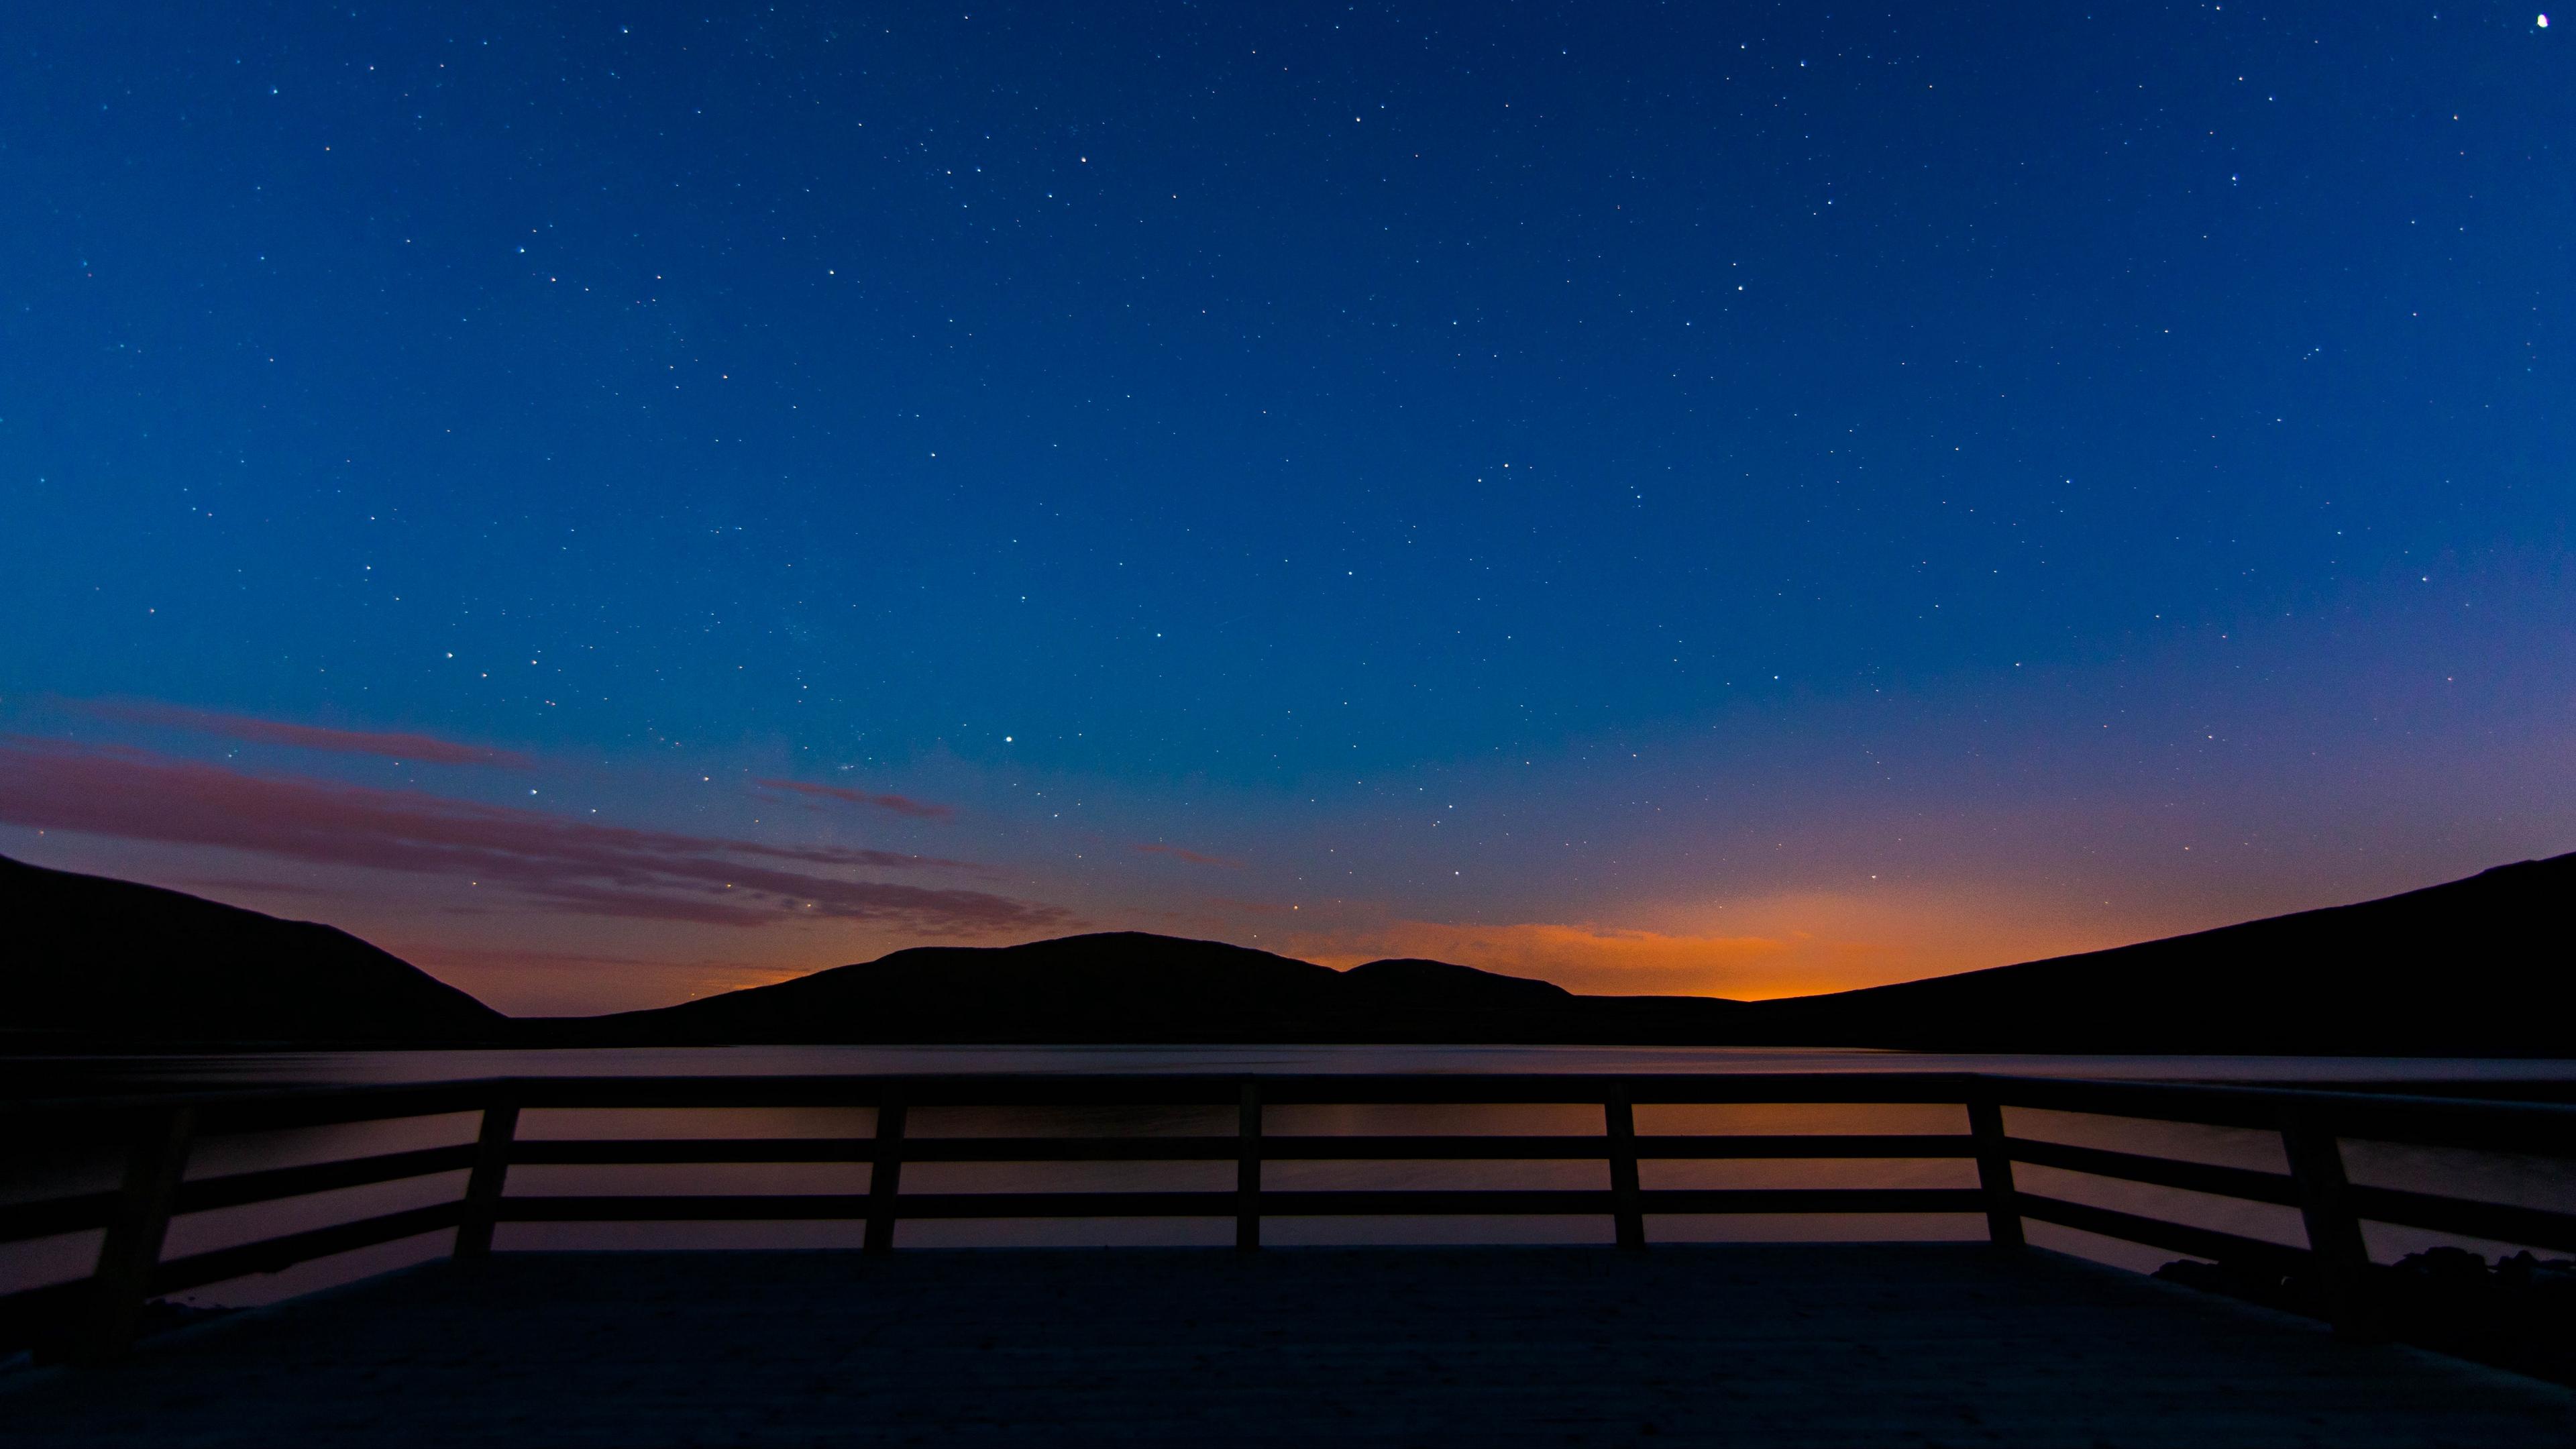 starry sky railing stars mountains 4k 1540574342 - starry sky, railing, stars, mountains 4k - Stars, starry sky, railing